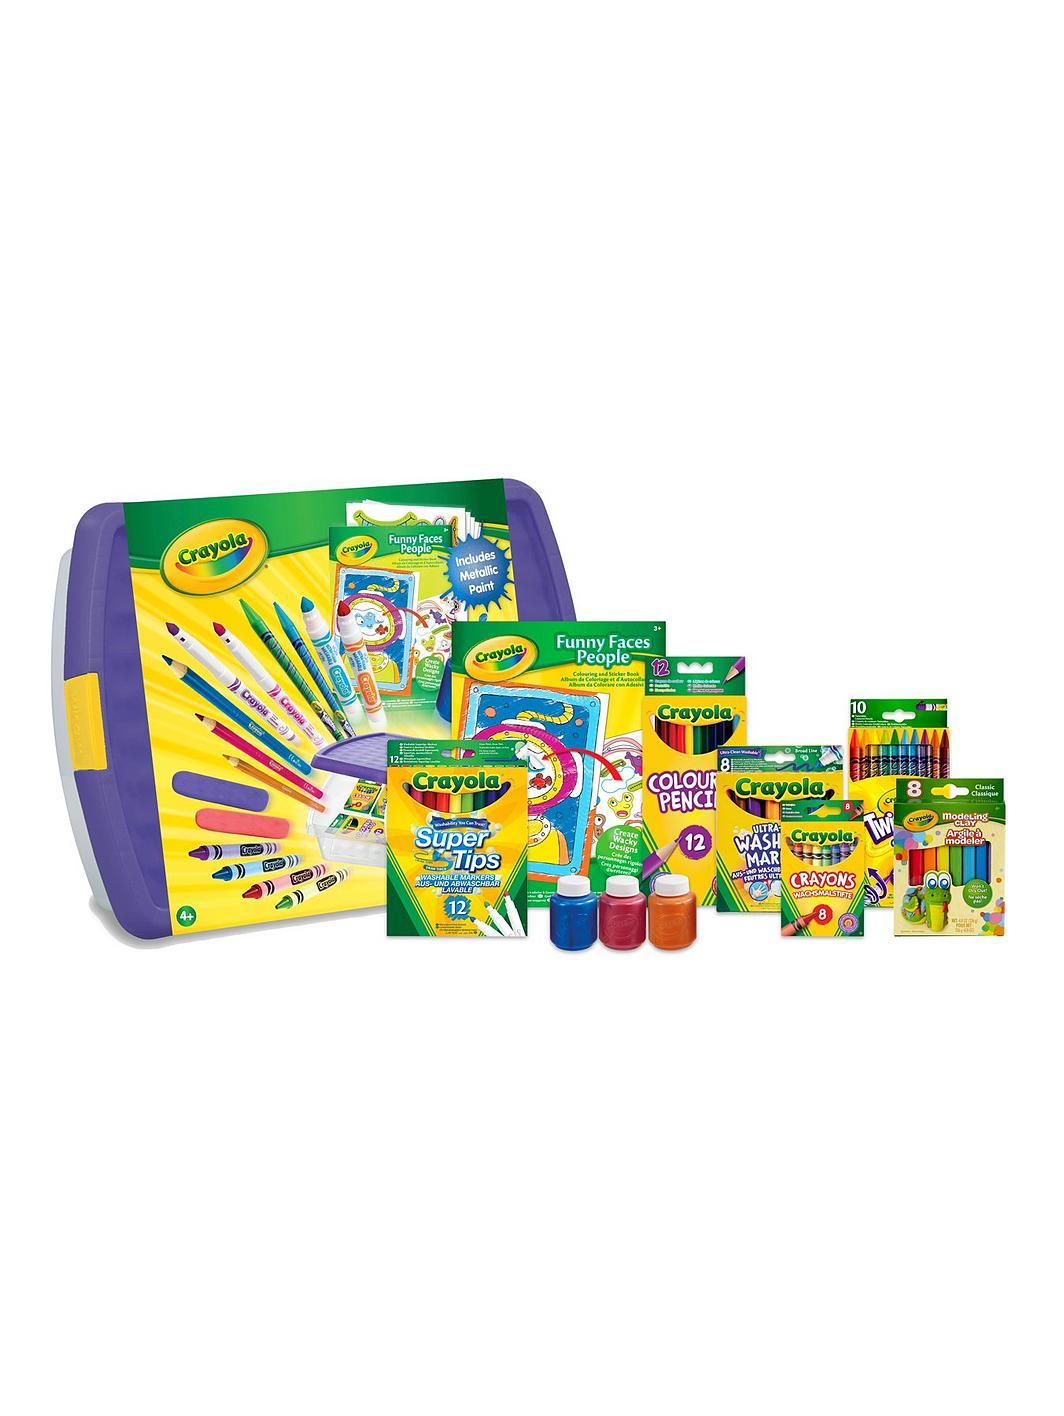 pack of 3 Crayola Twistable Graphite Pencils